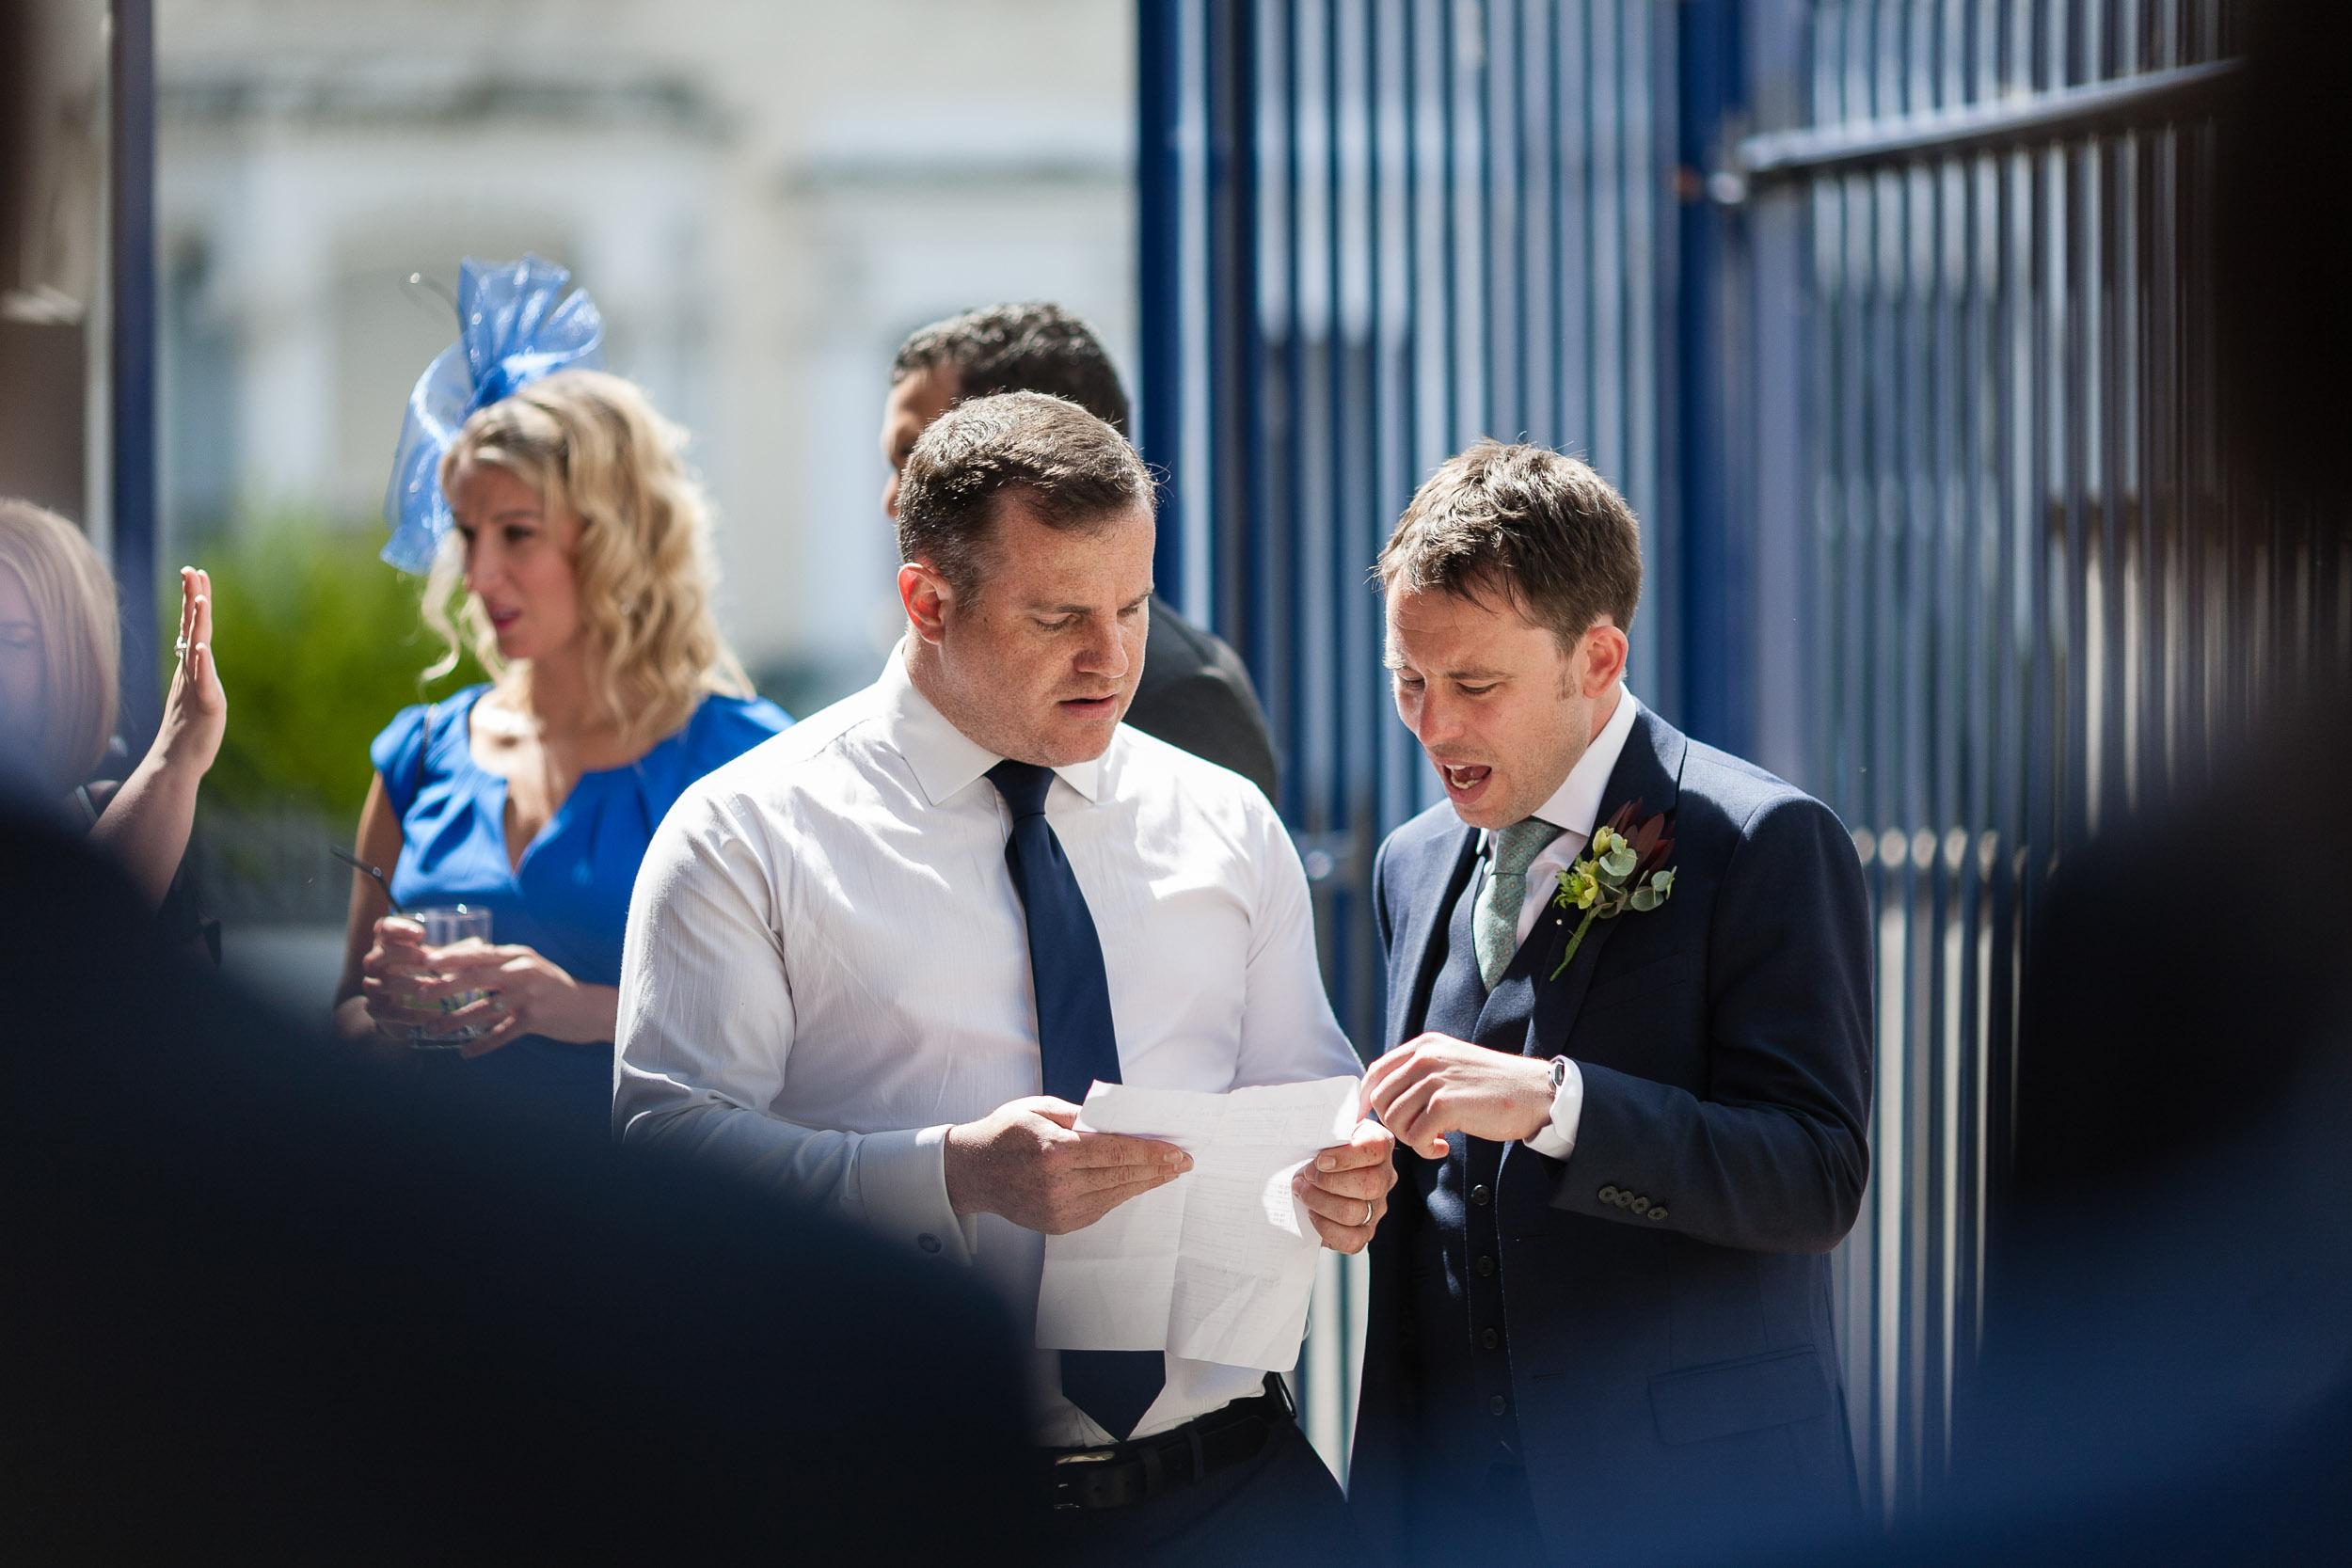 brockwell-lido-brixton-herne-hill-wedding-085.jpg